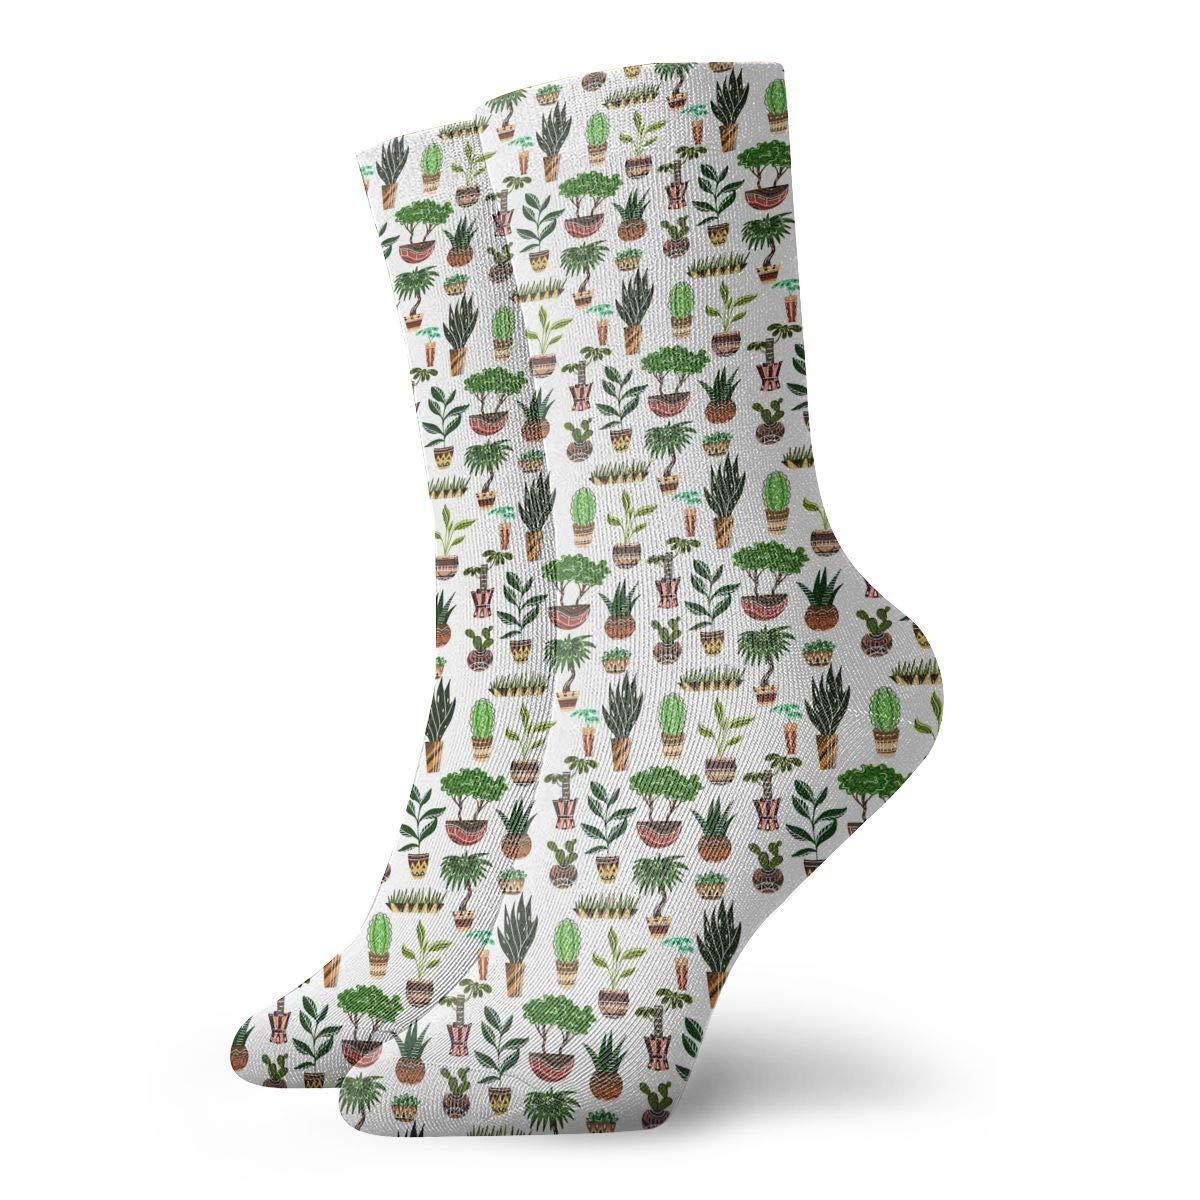 Unisex Texture Cartoon Home Flowers Athletic Quarter Ankle Print Breathable Hiking Running Socks